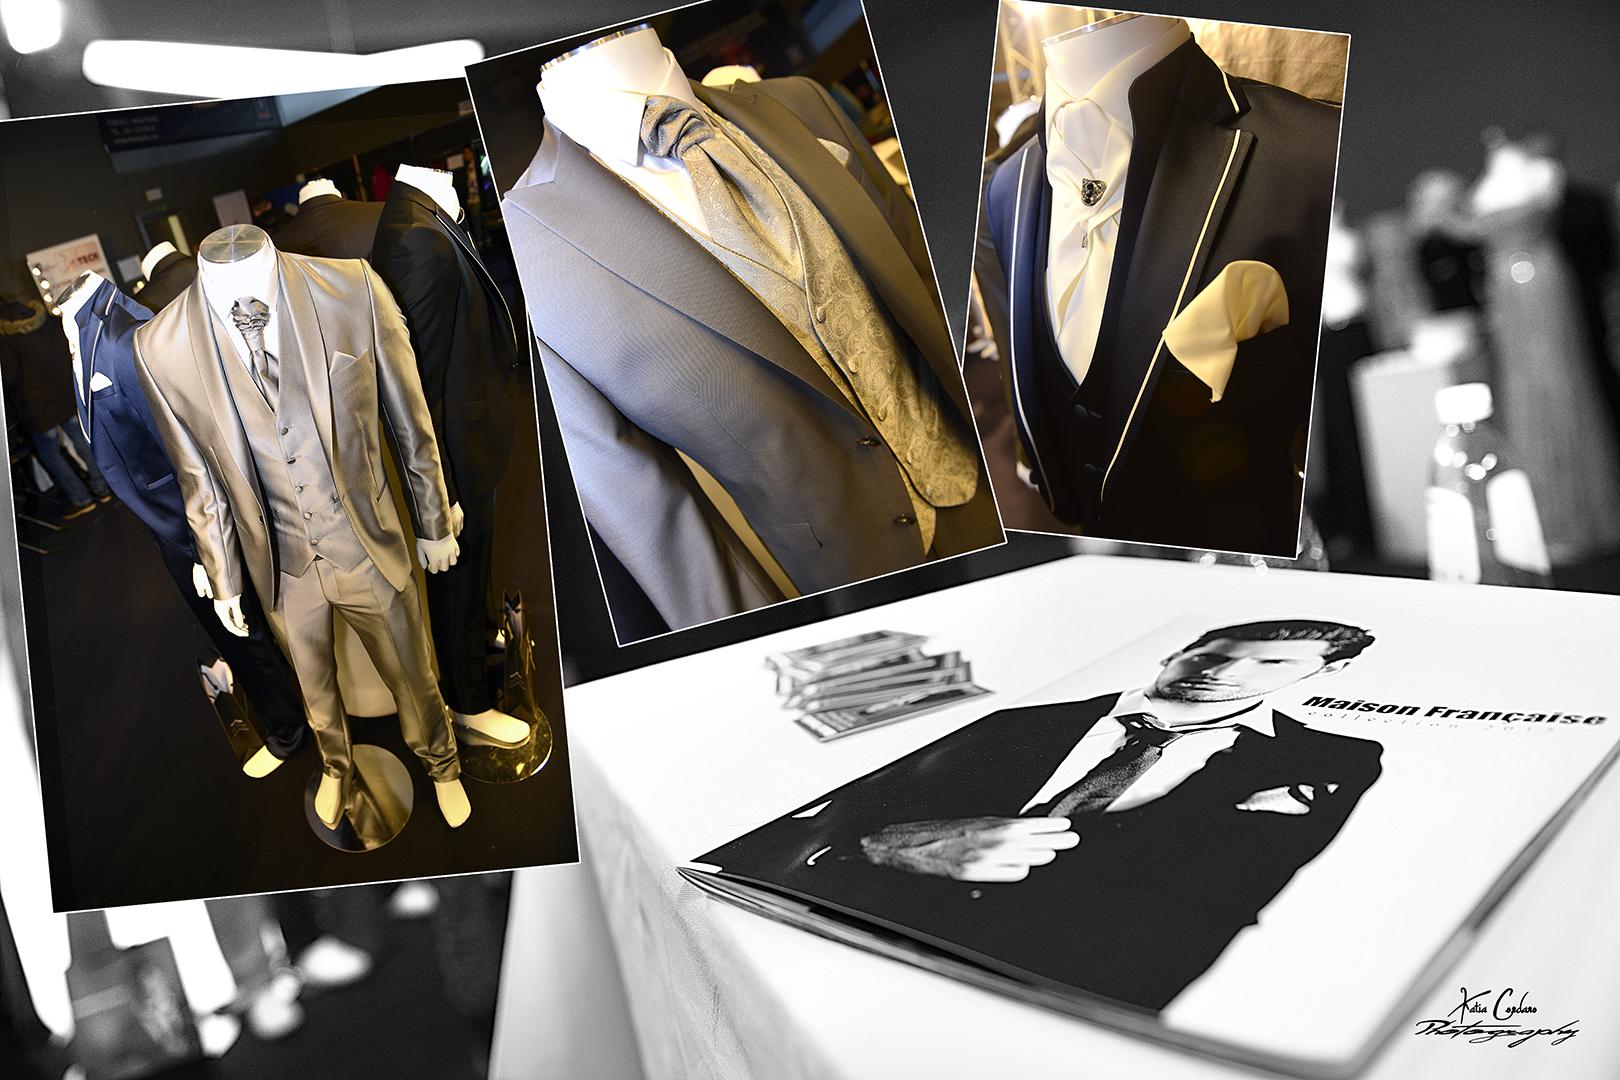 Salon du mariage - Salon du mariage biganos ...